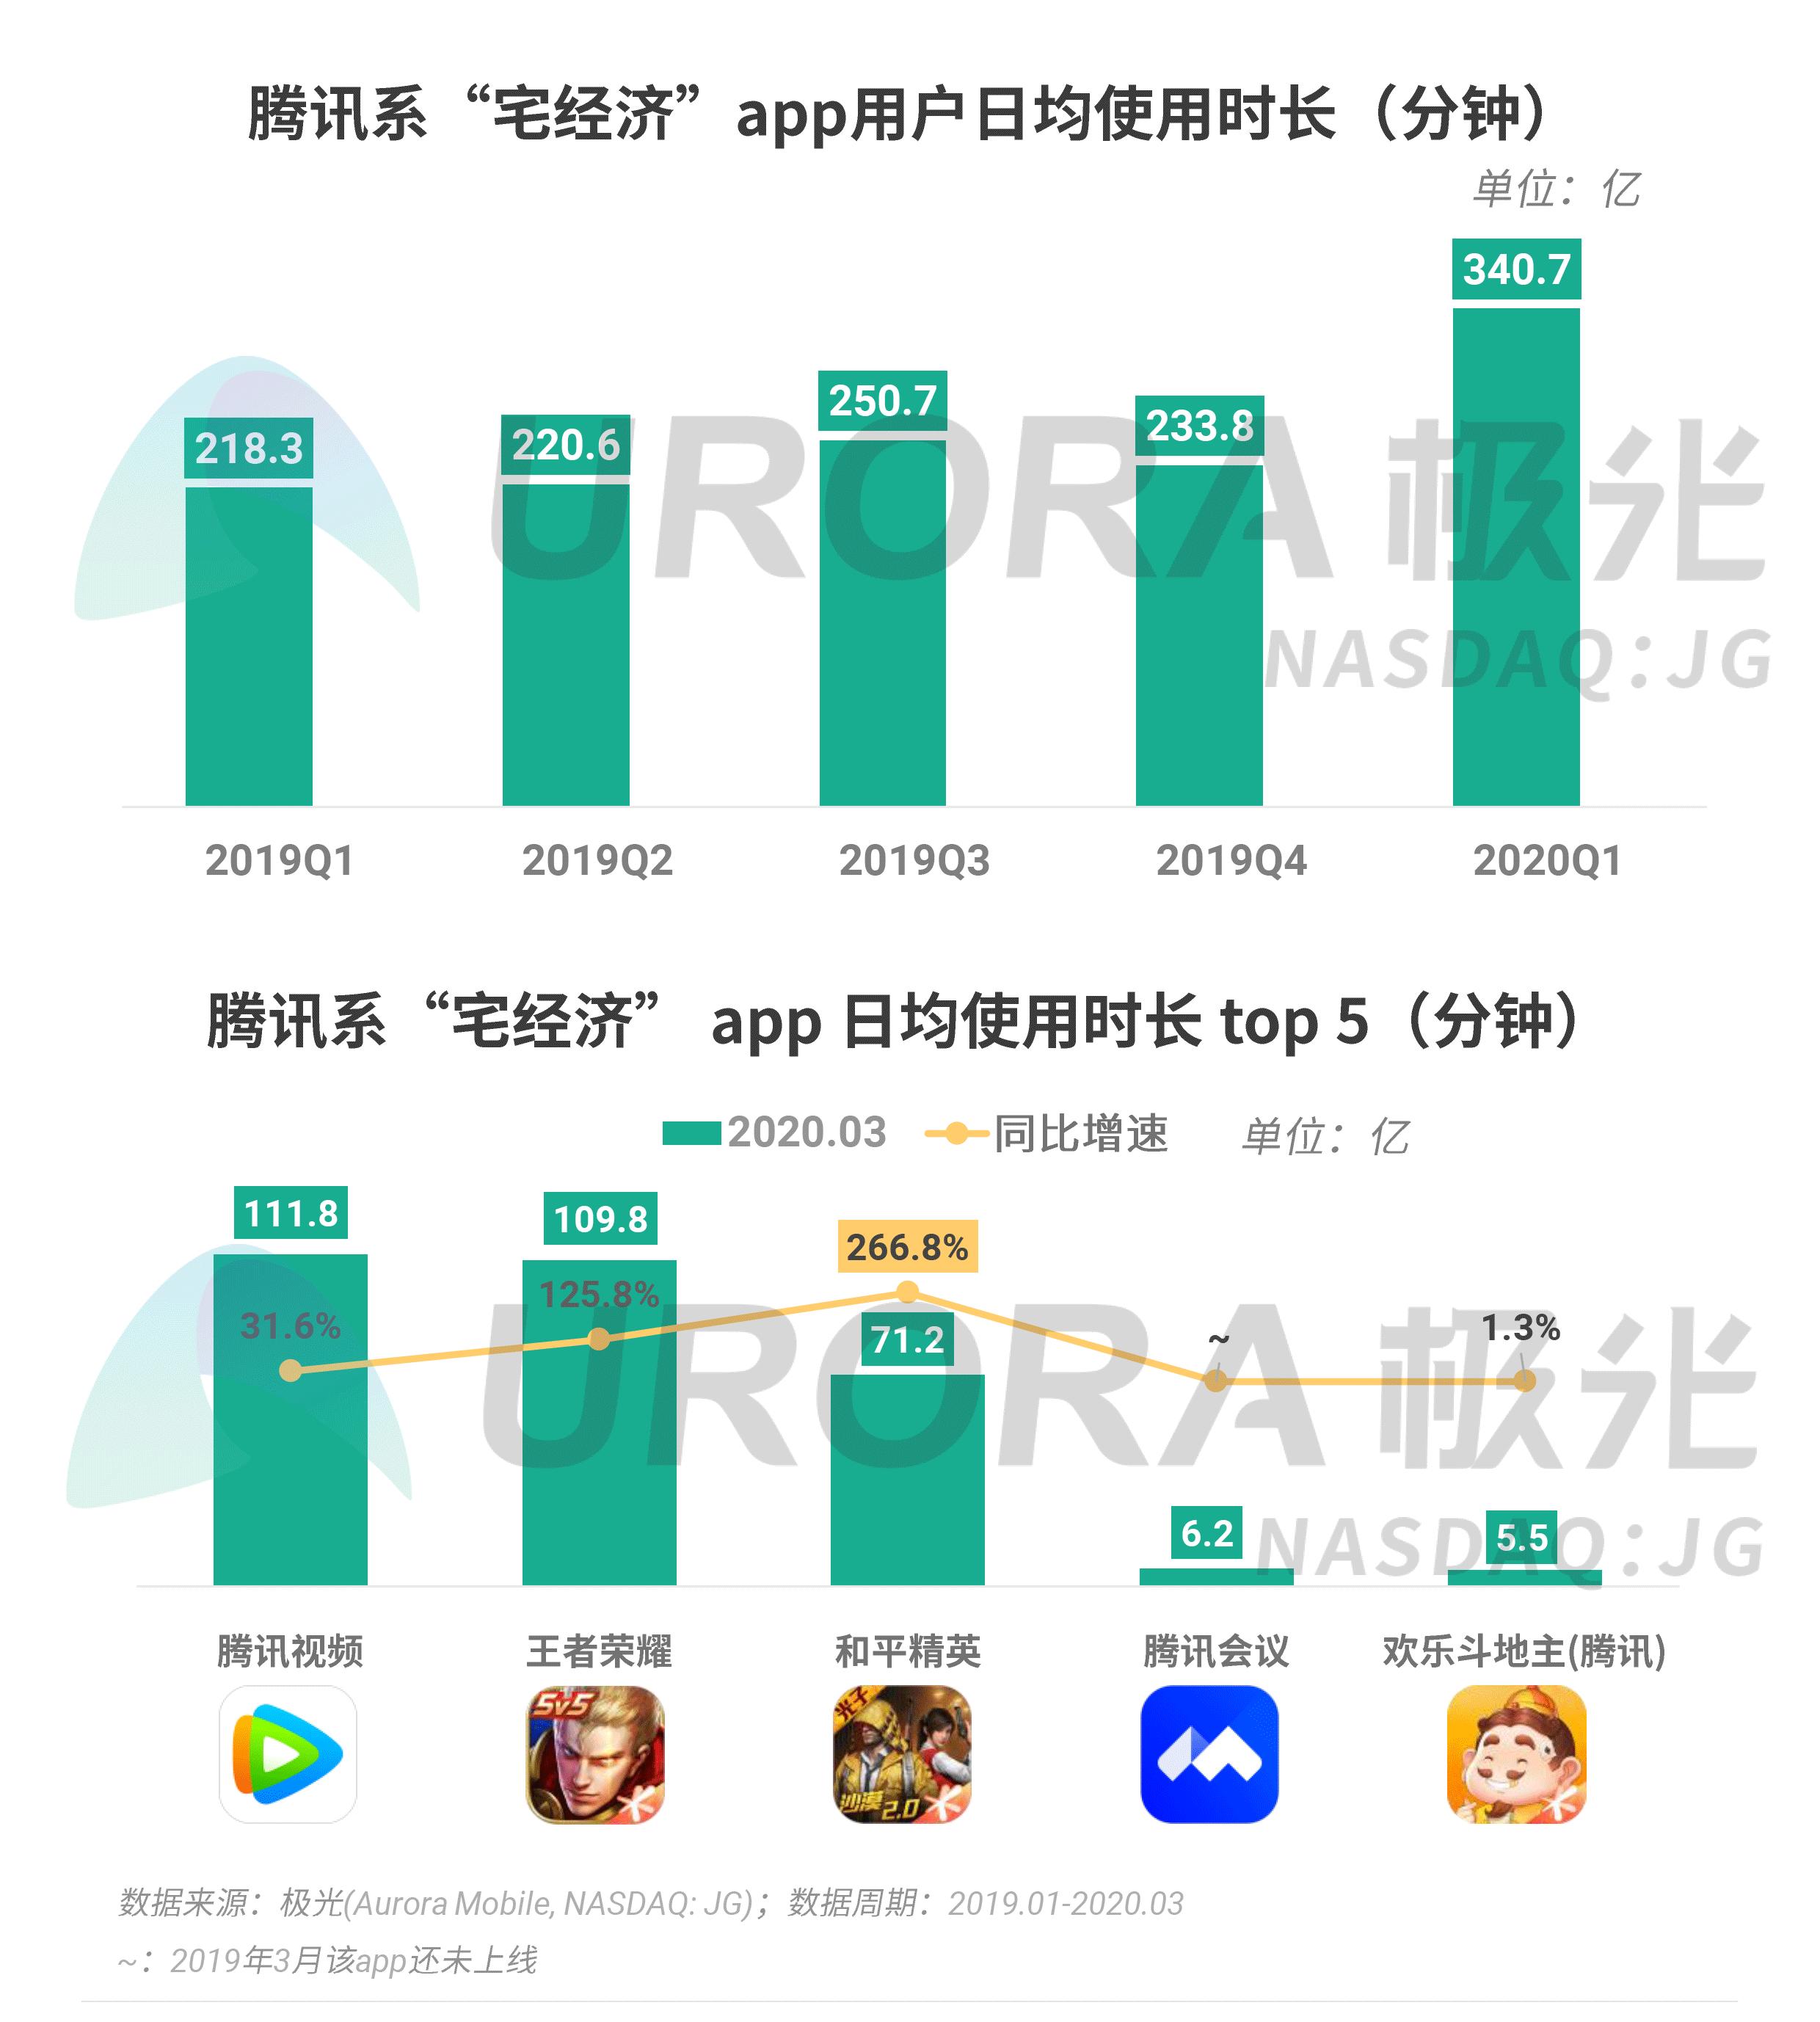 极光:2020年Q1 app榜单 (13).png